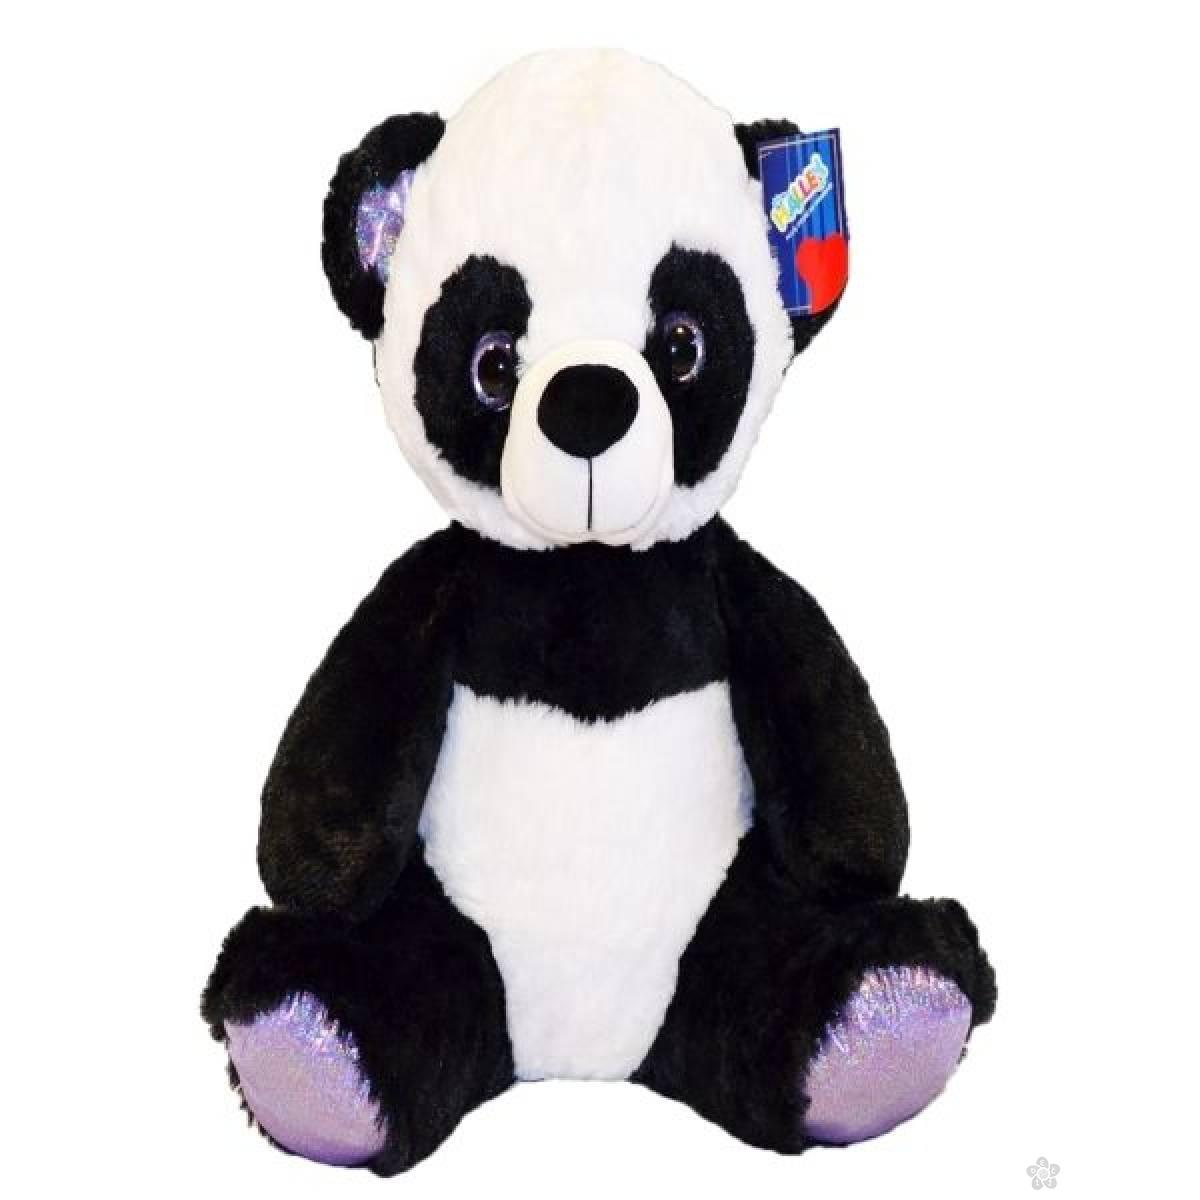 Plišani panda 35cm 11/78706